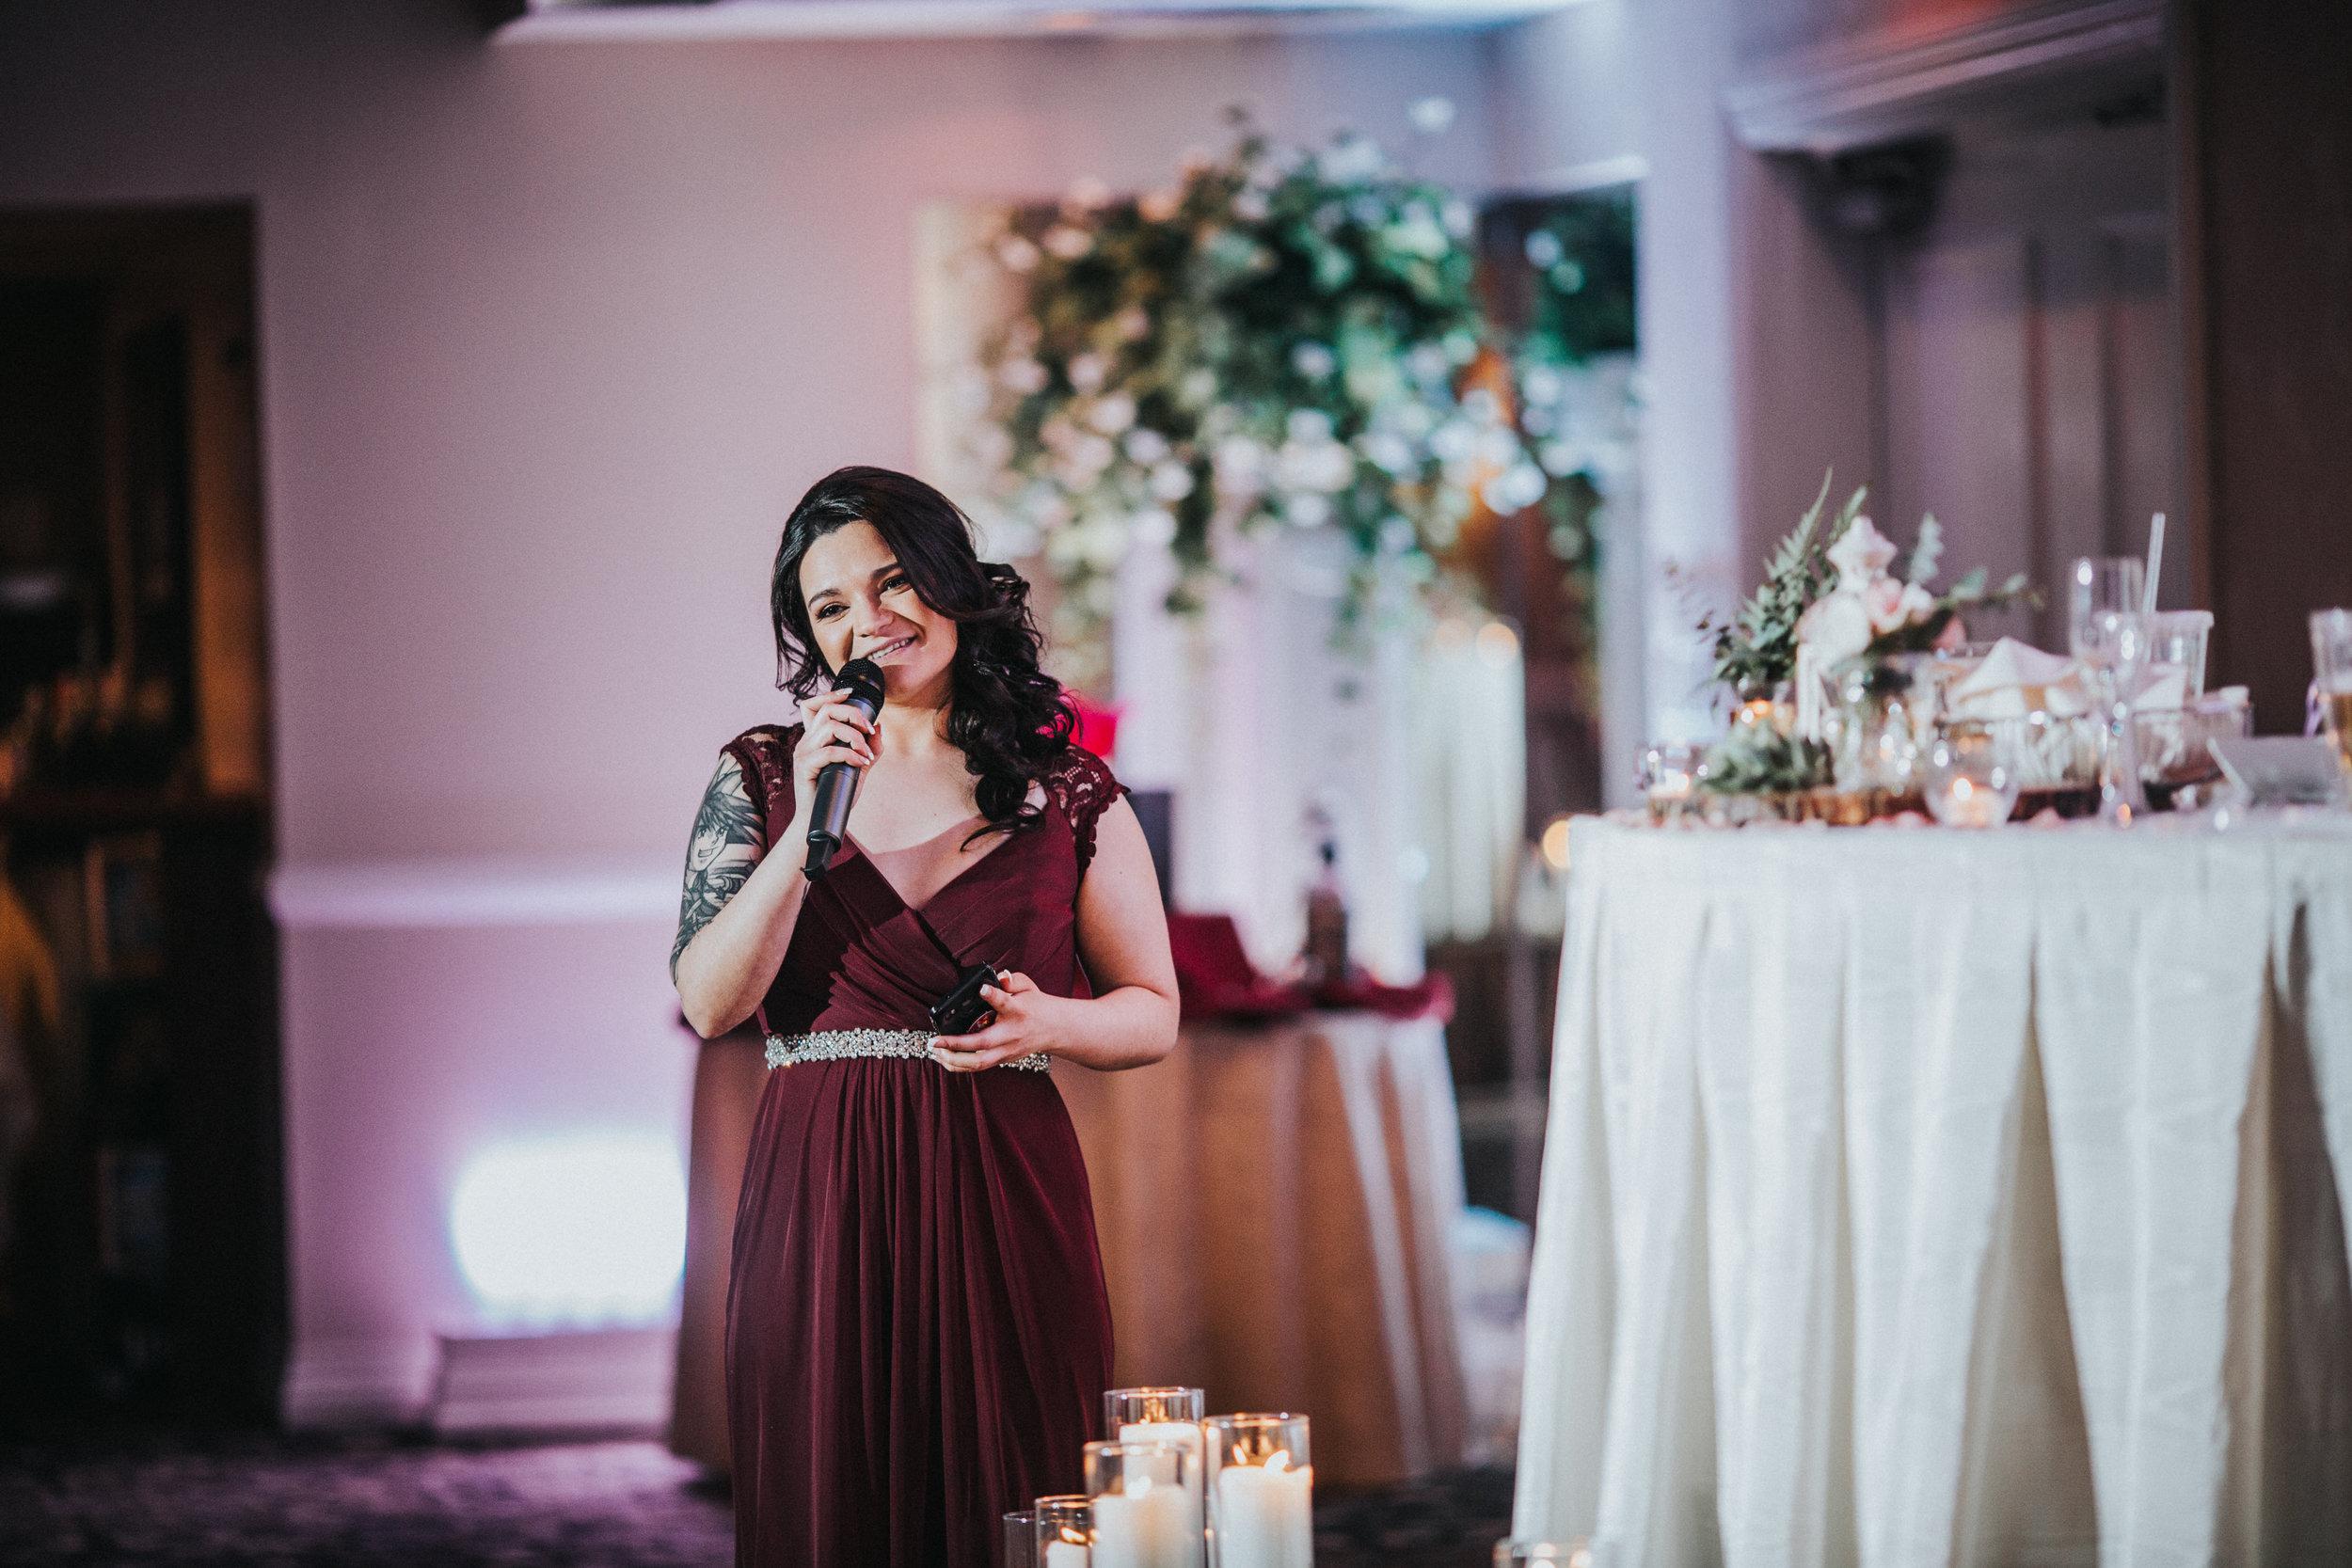 New-Jersey-Wedding-Photographer-ReceptionCenter-Valeria&Mike-Reception (42 of 265).jpg